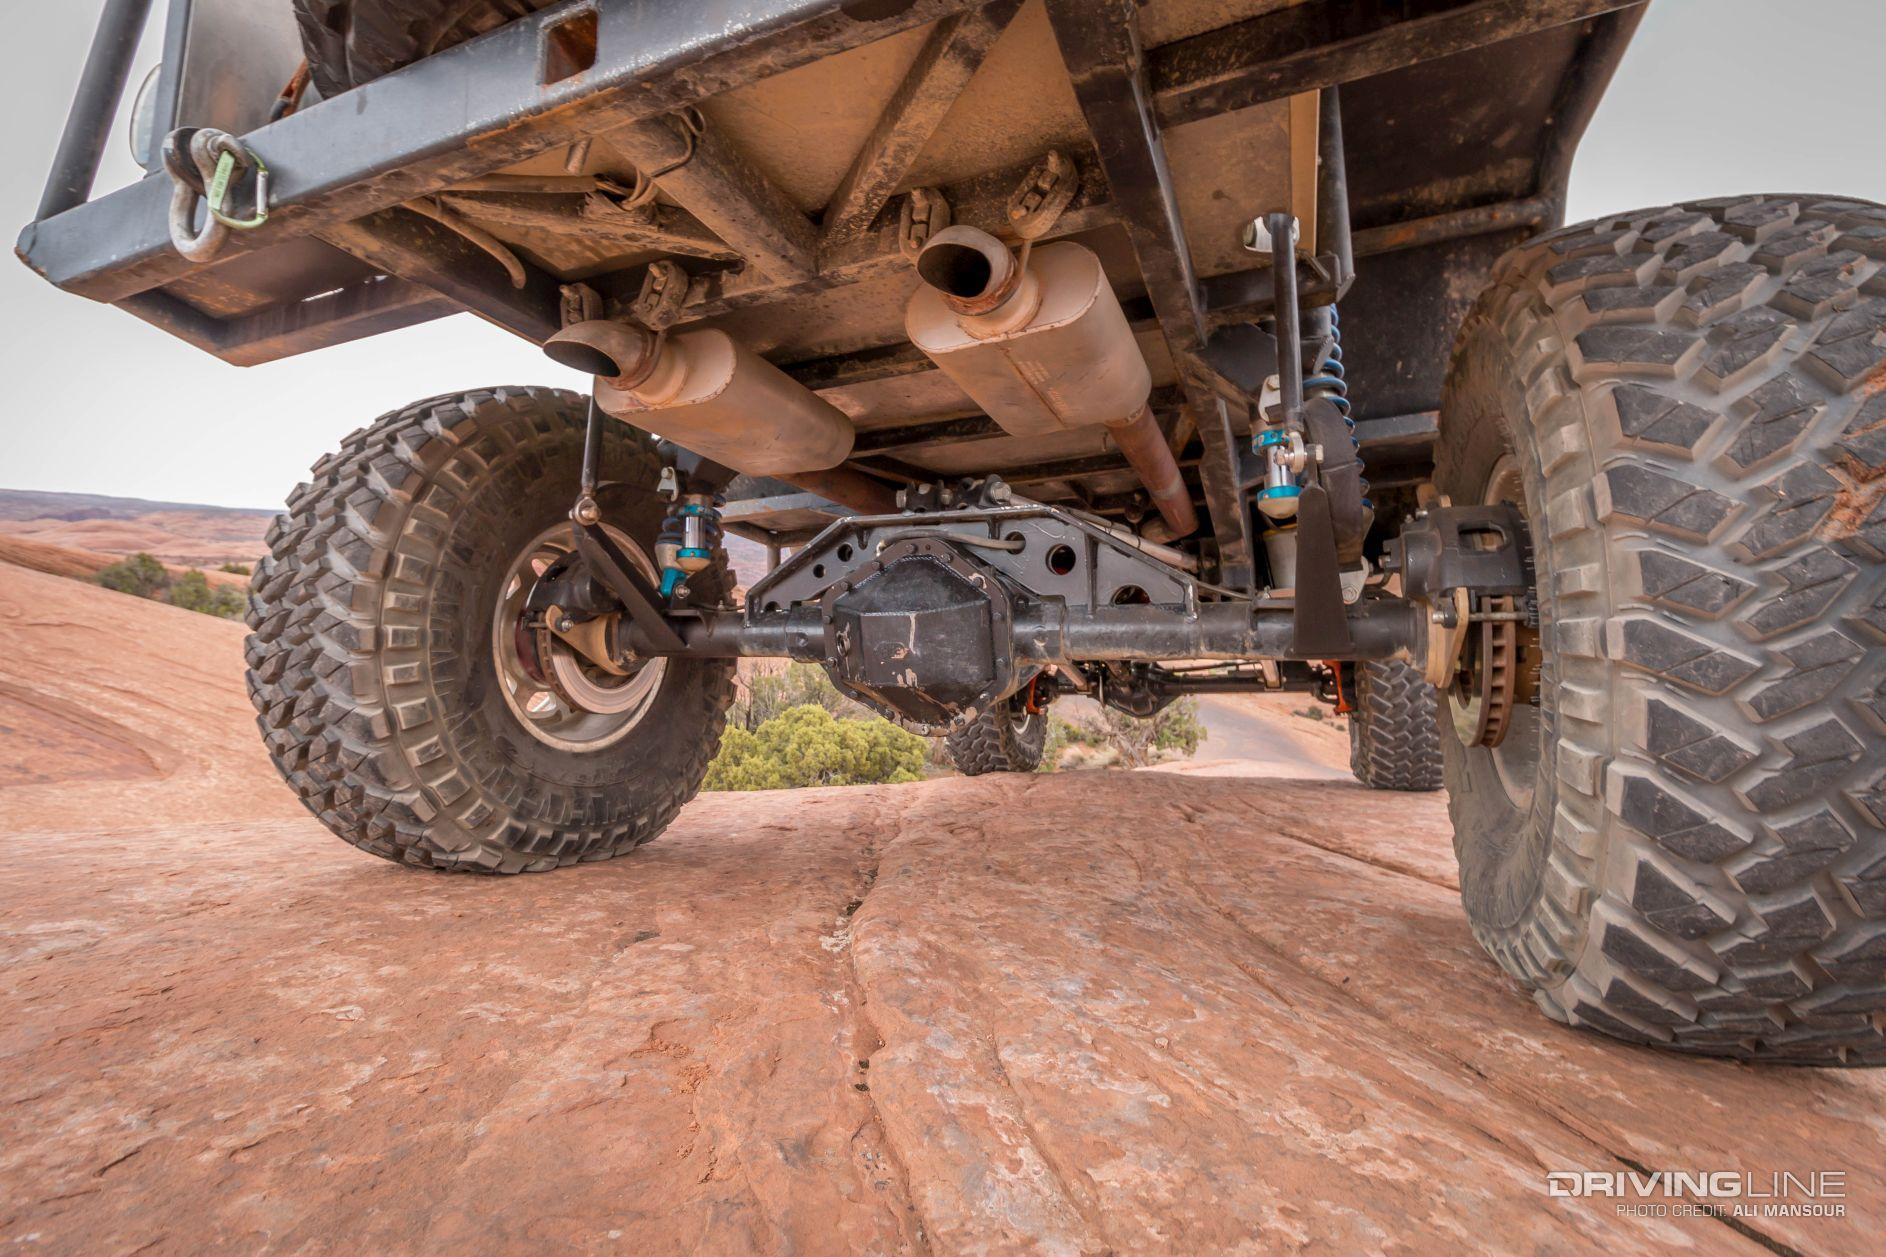 Killer K30 Offroad Design S Latest Chevy Truck Build